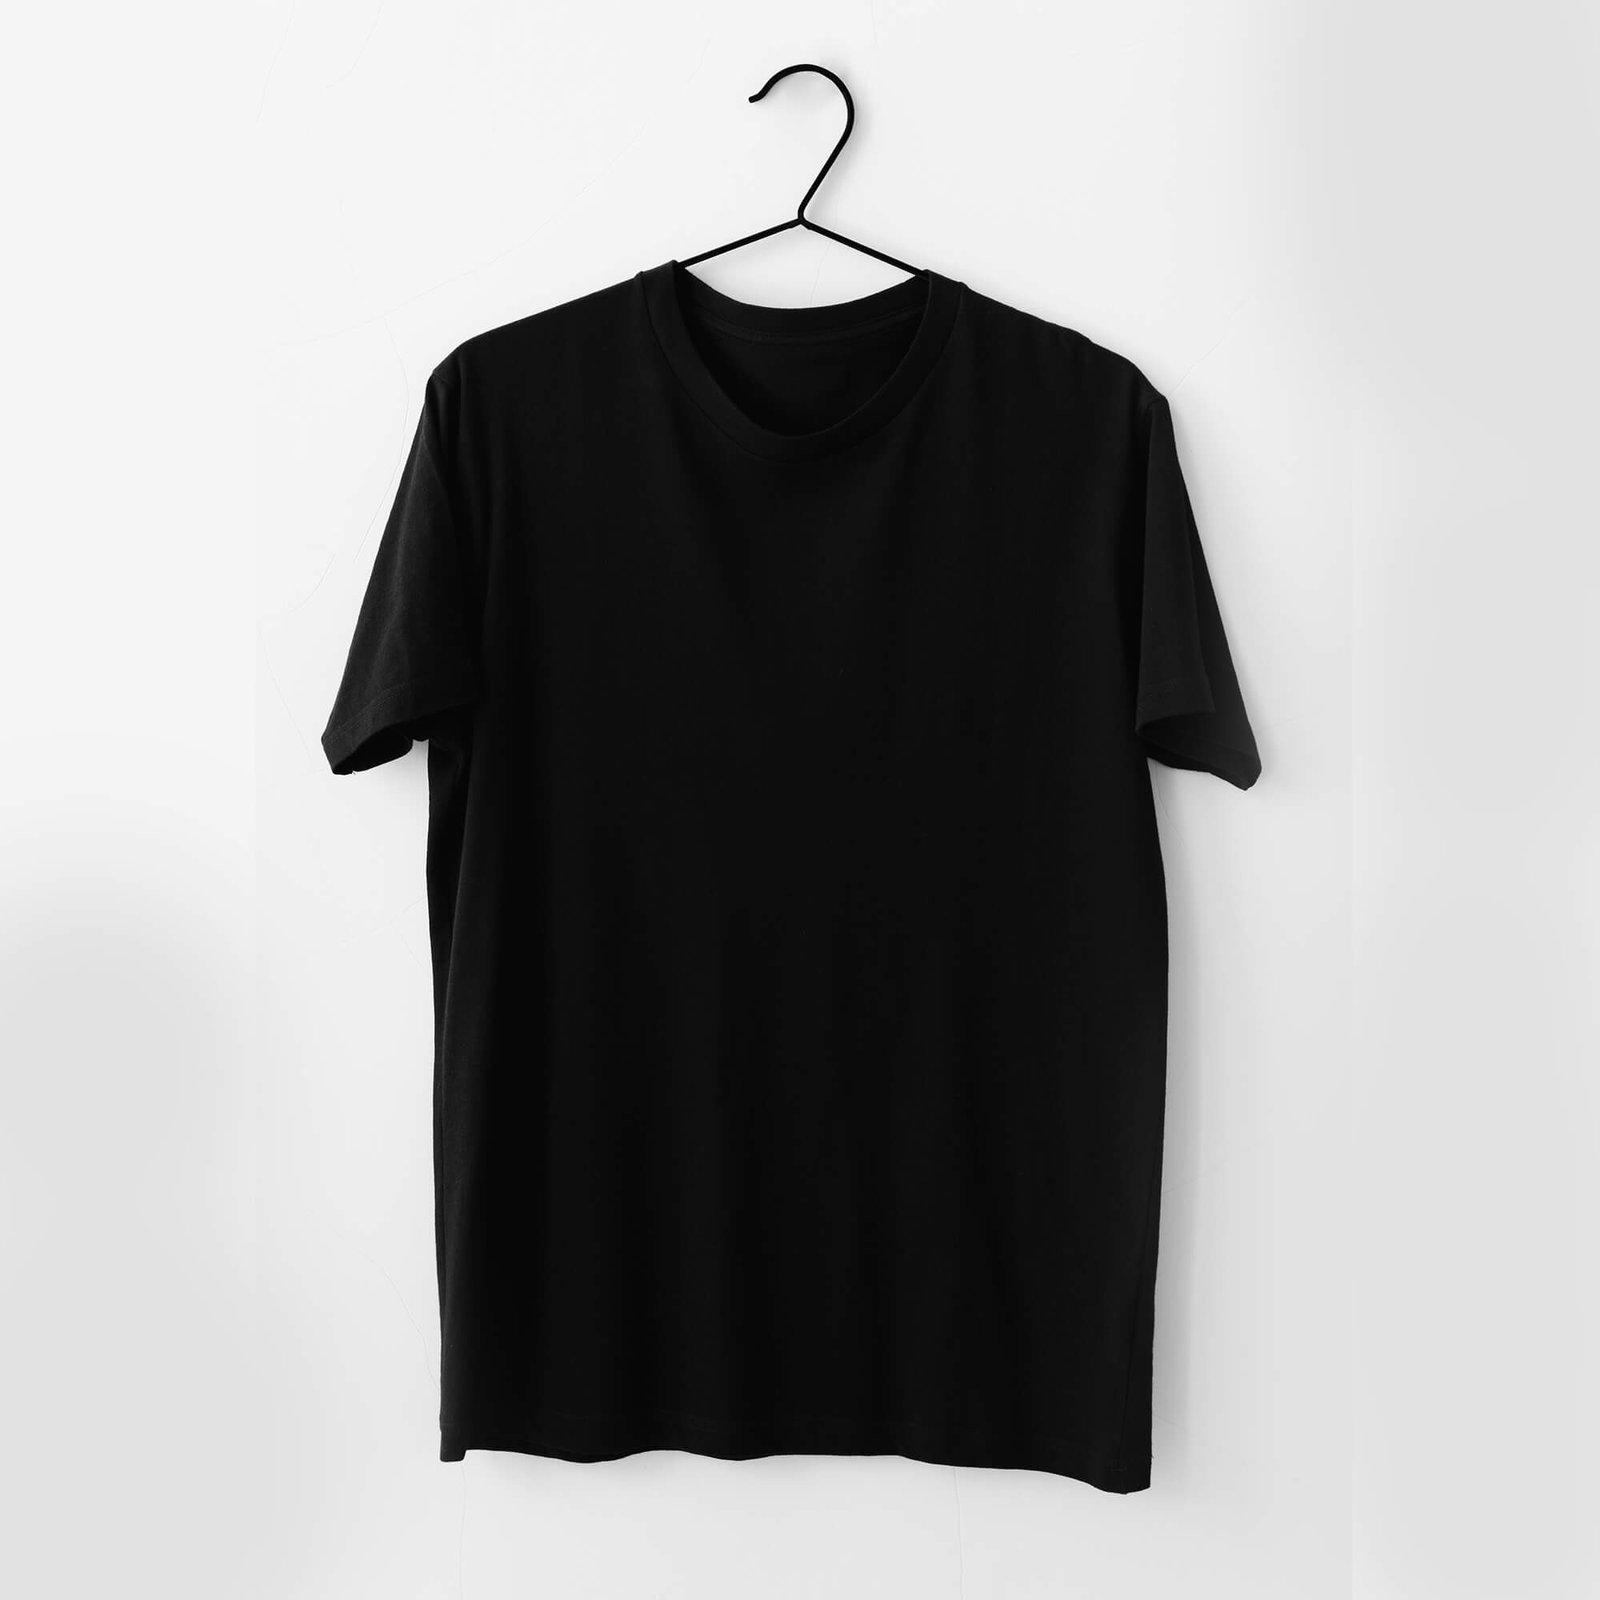 Blank Free Tee Shirt Mockup PSD Template (1)